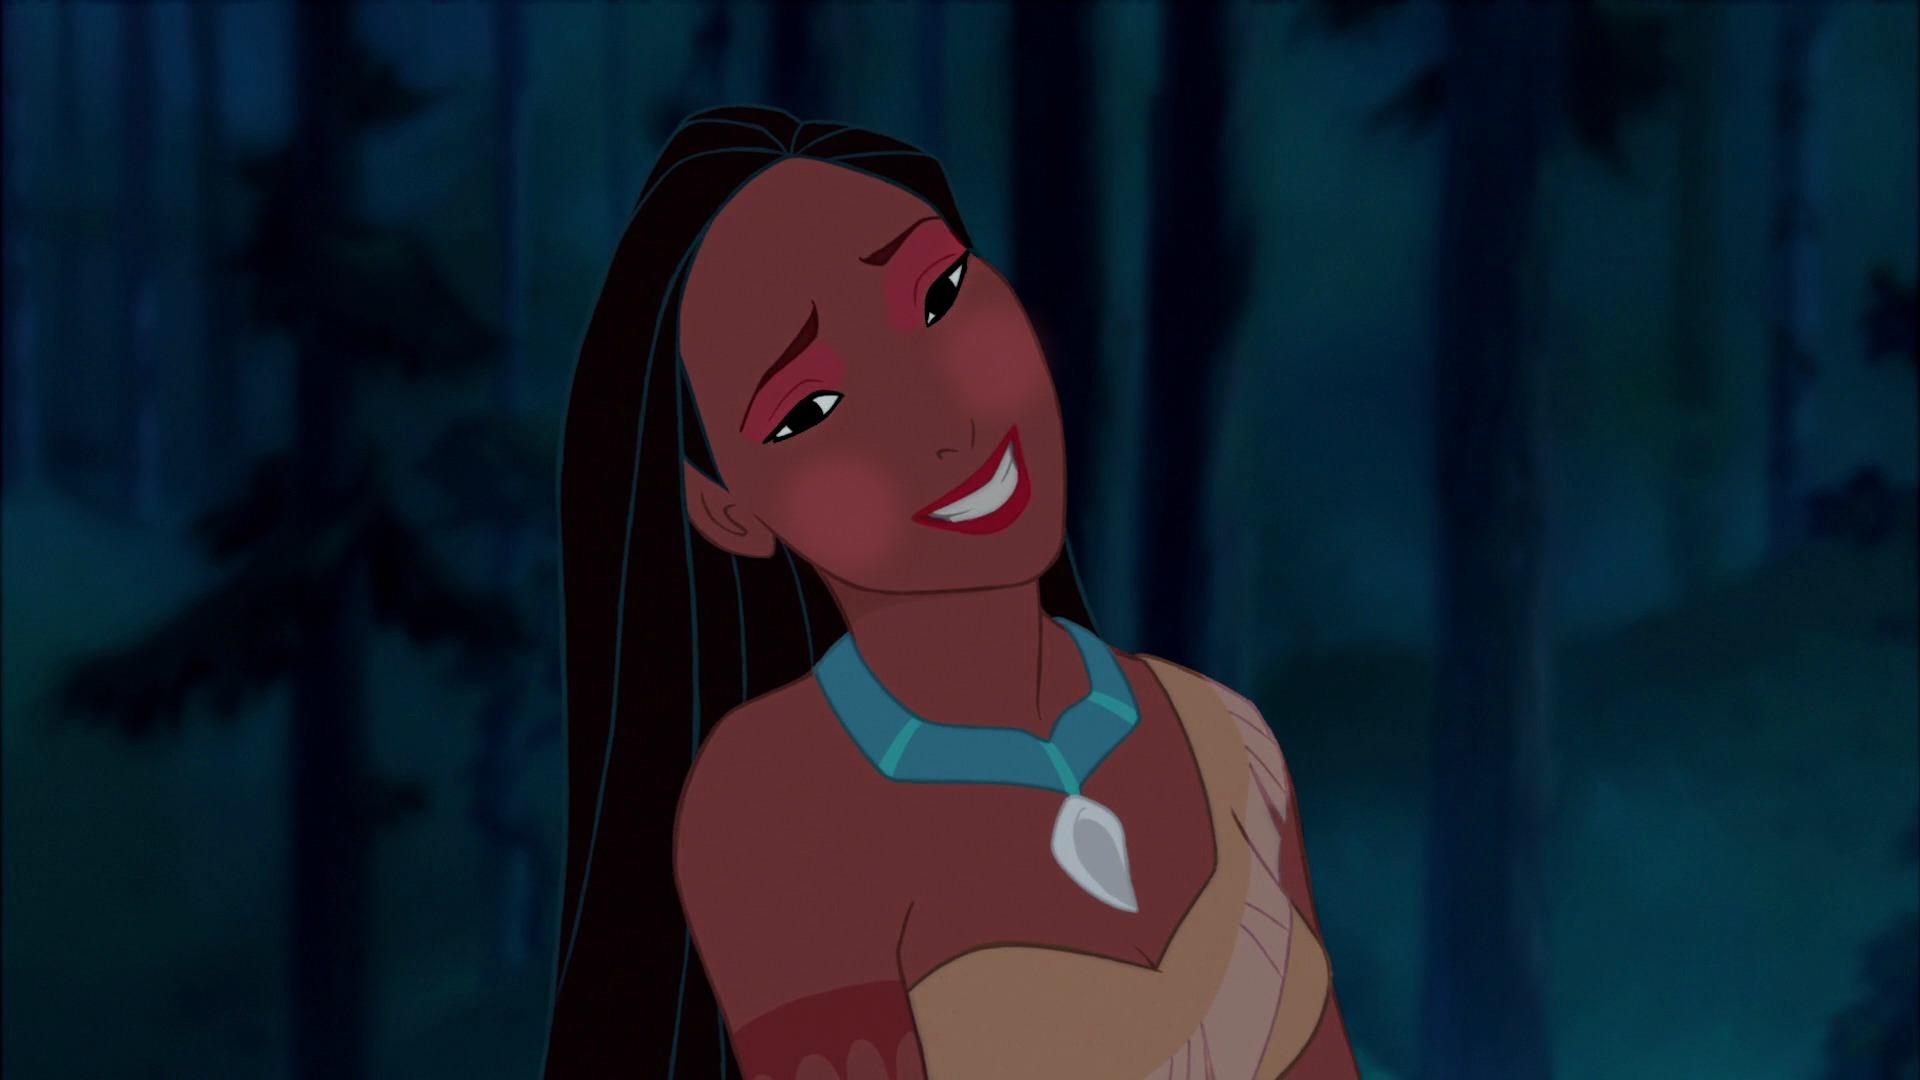 Pocahontas bright look disney princess photo 34805458 fanpop